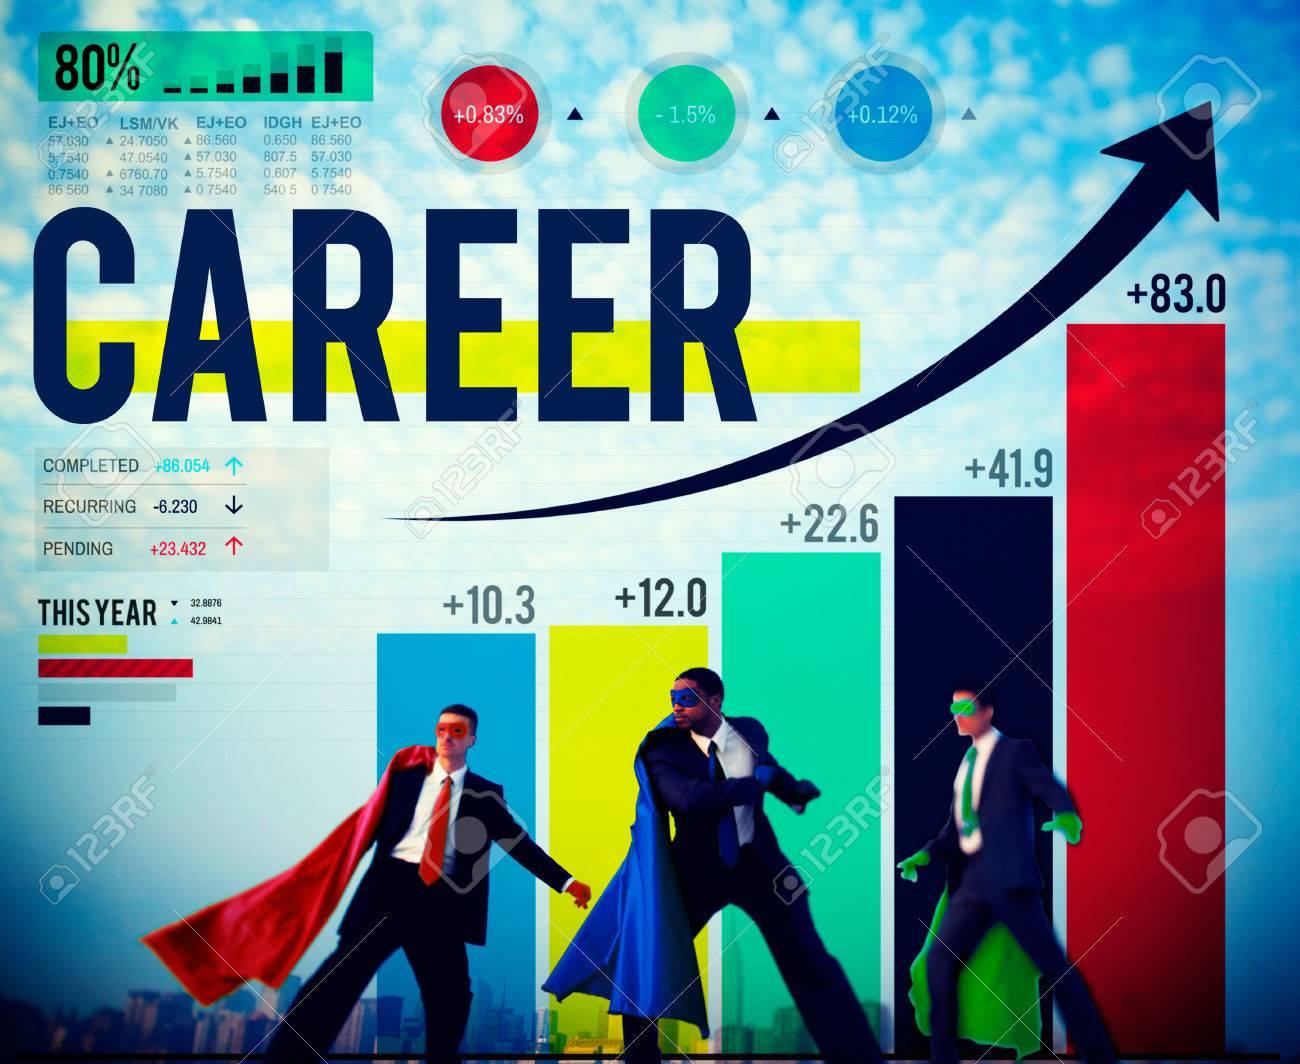 career employment data analysis recruitment concept stock photo career employment data analysis recruitment concept stock photo 44638122